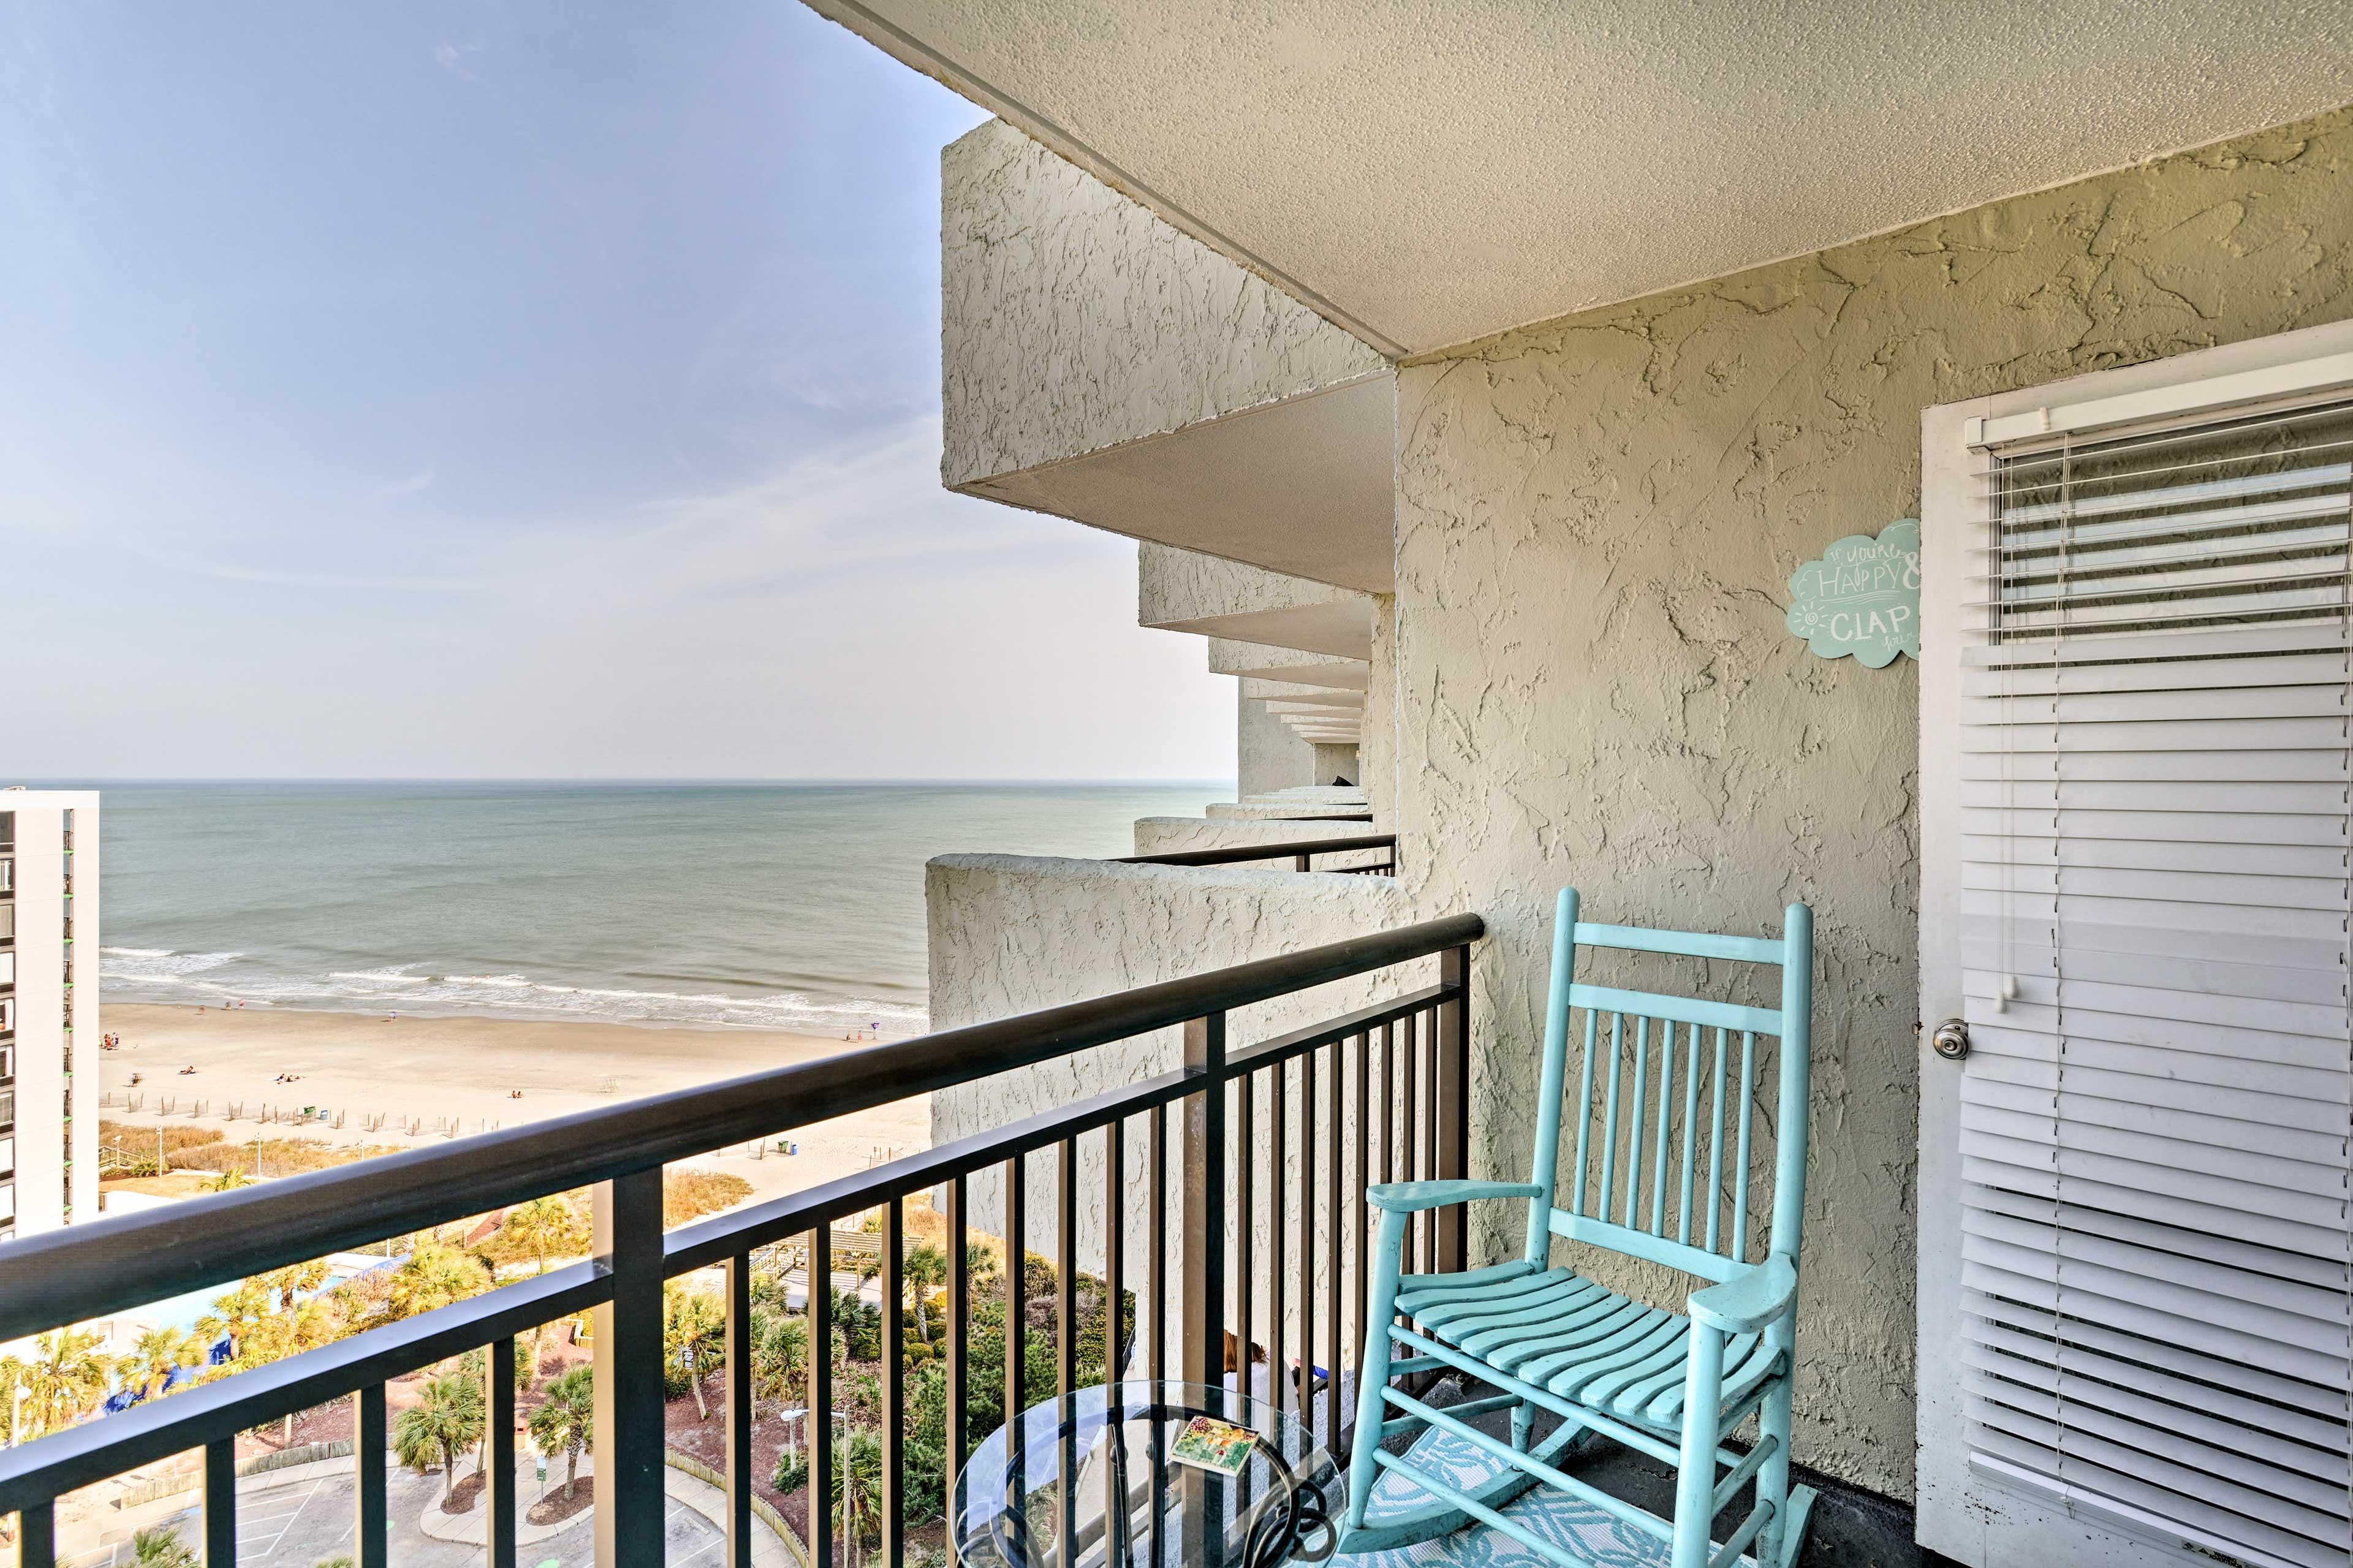 Myrtle Beach Vacation Rental | 1BR | 1BA | 500 Sq Ft | 15th Floor w/ Elevator